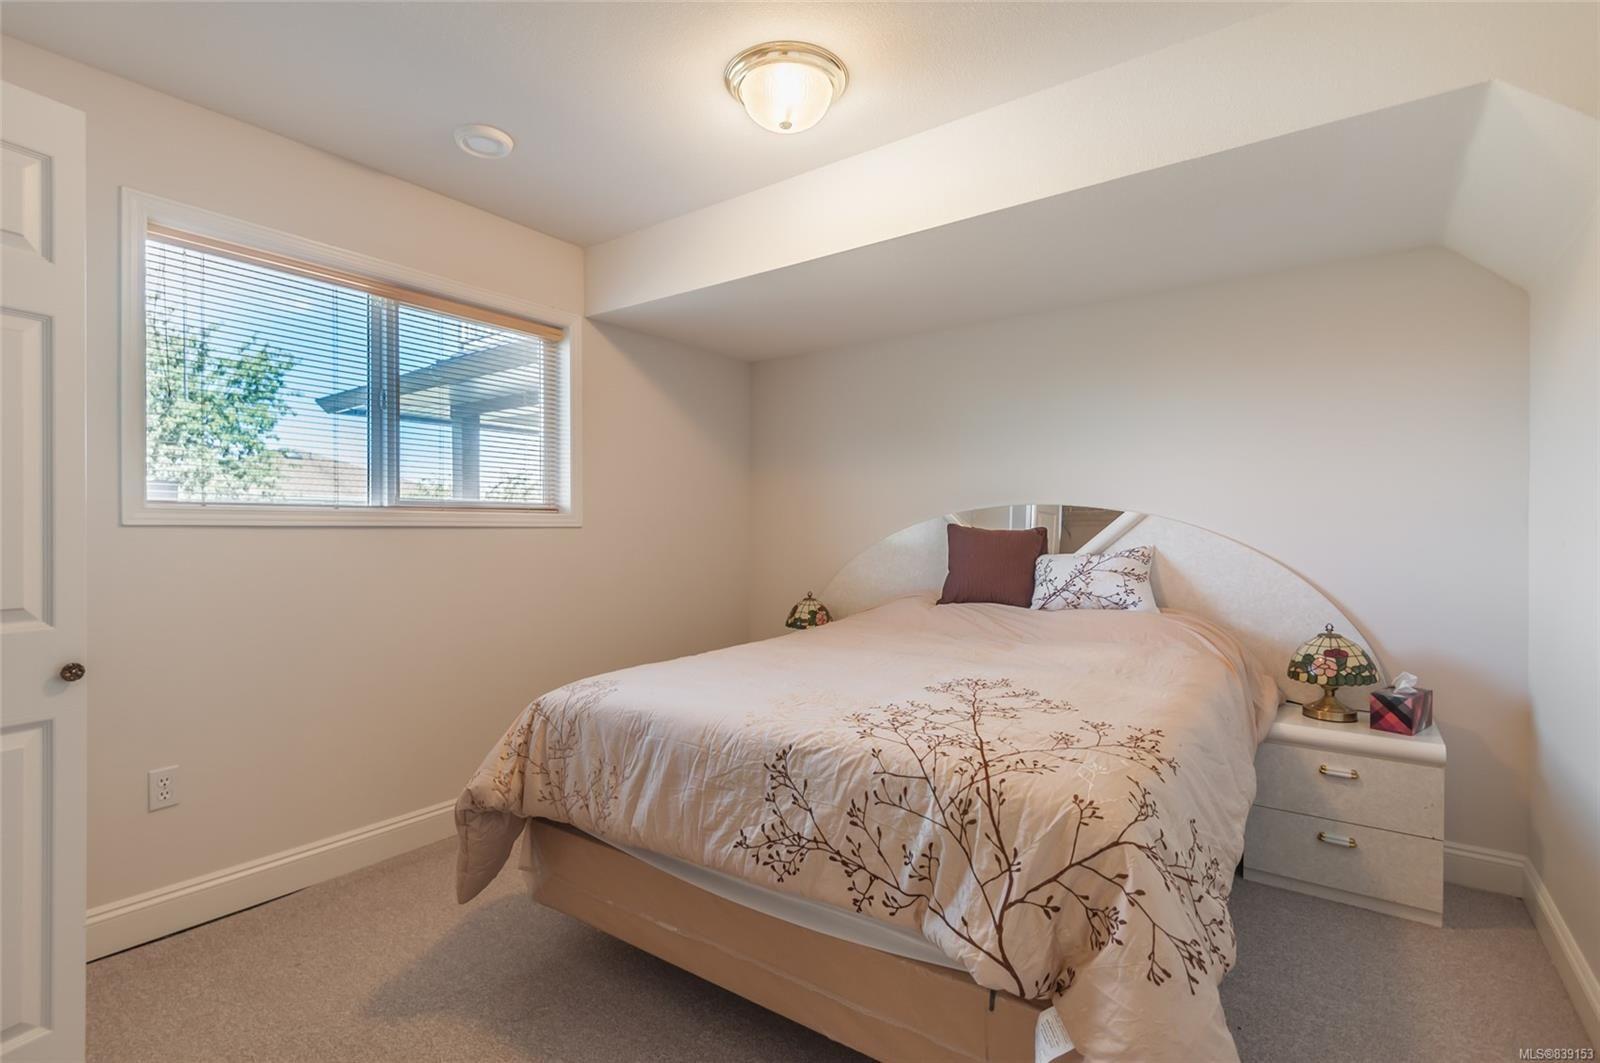 Photo 42: Photos: 6412 Dover Rd in NANAIMO: Na North Nanaimo House for sale (Nanaimo)  : MLS®# 839153